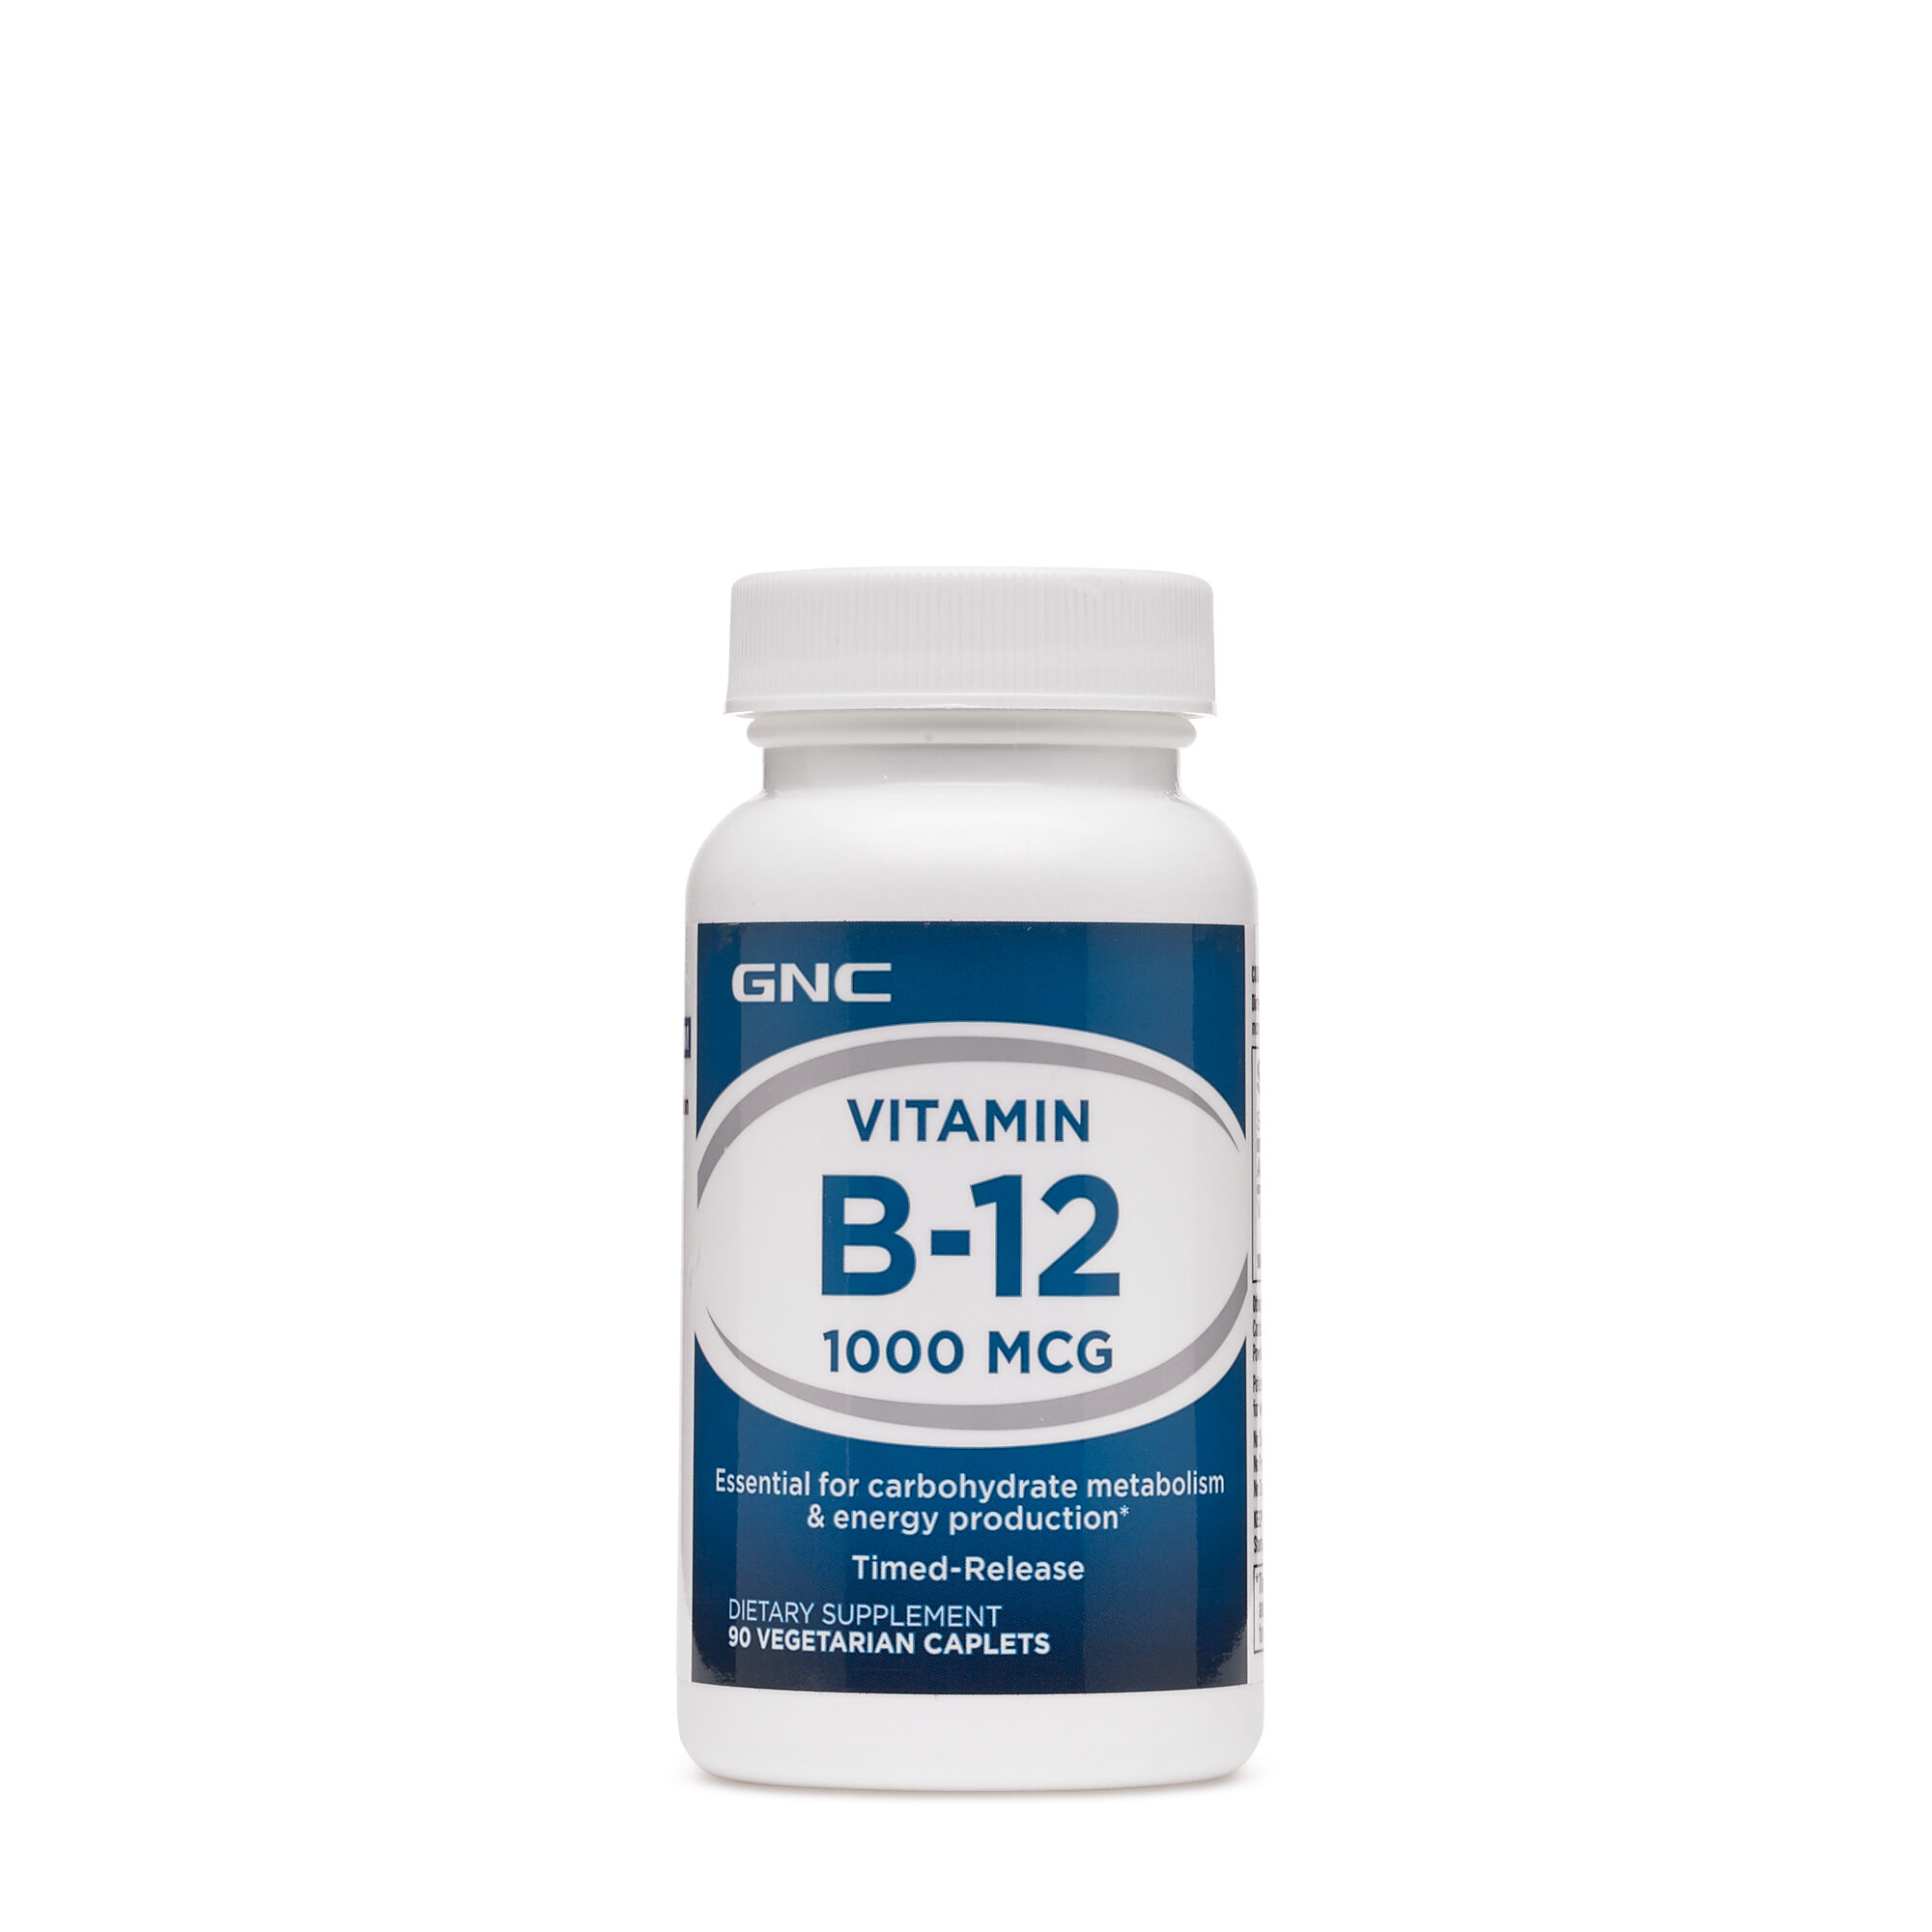 GNC Vitamin B12 1000 MCG 90 Vegetarian Caplets   eBay